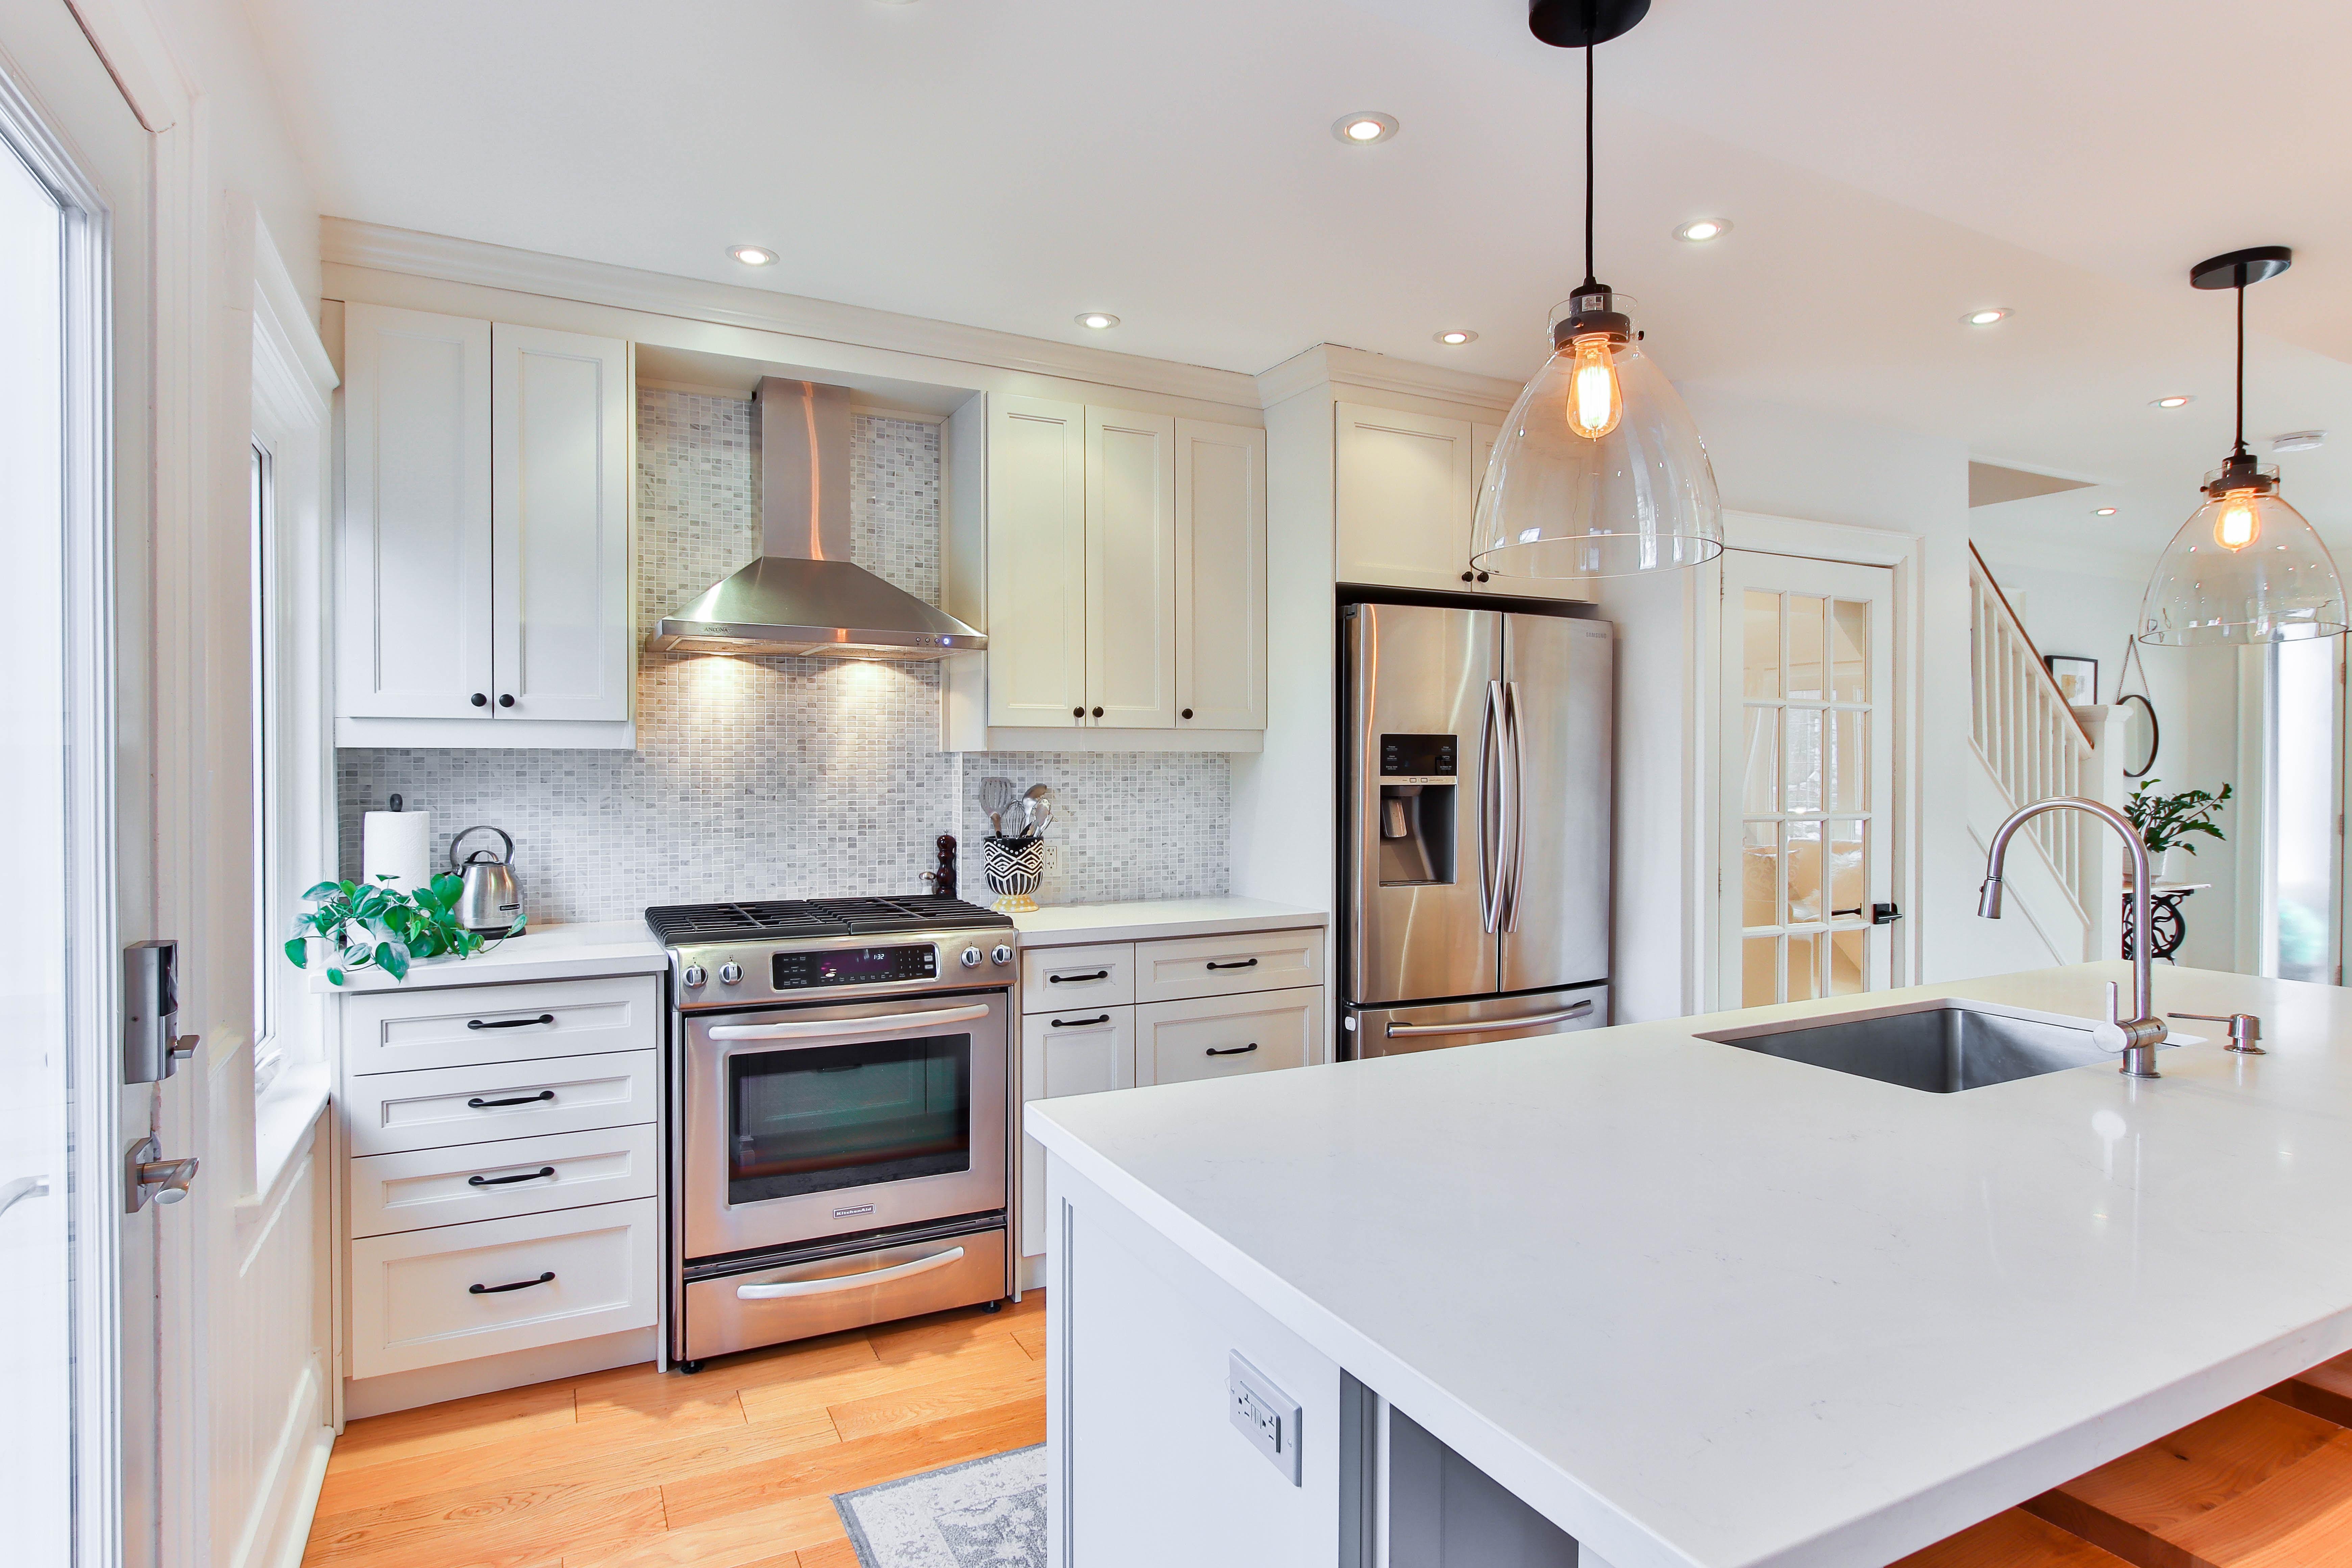 white wooden kitchen cabinet and white kitchen counter